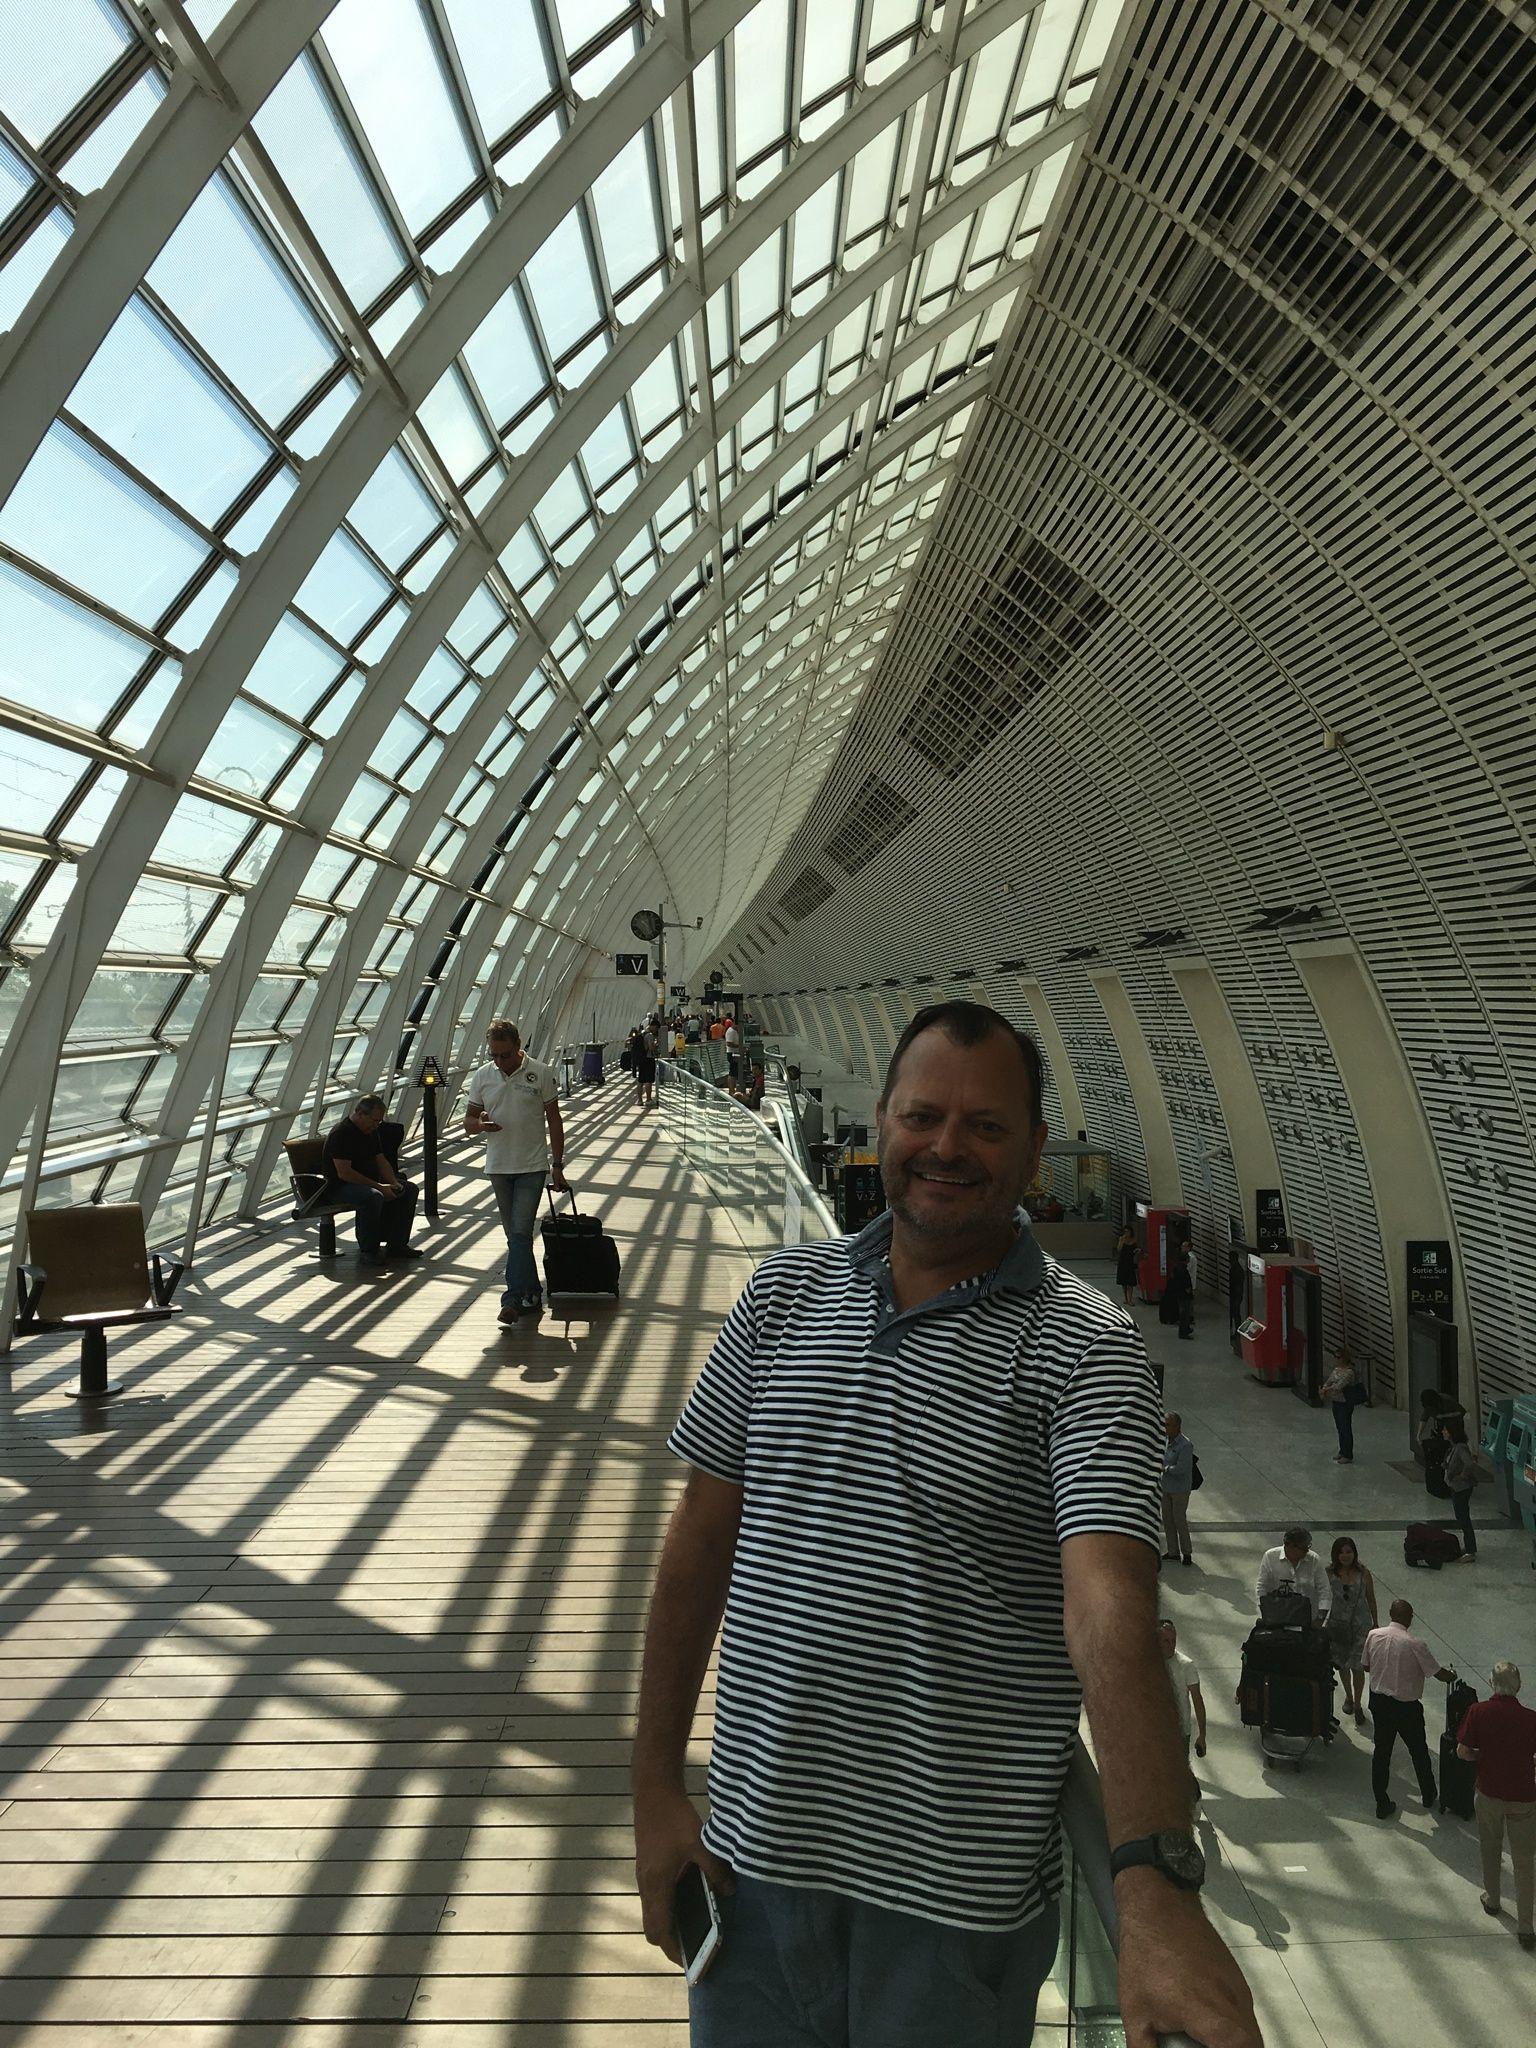 Avignon Train station | Train station, Landmarks, Travel